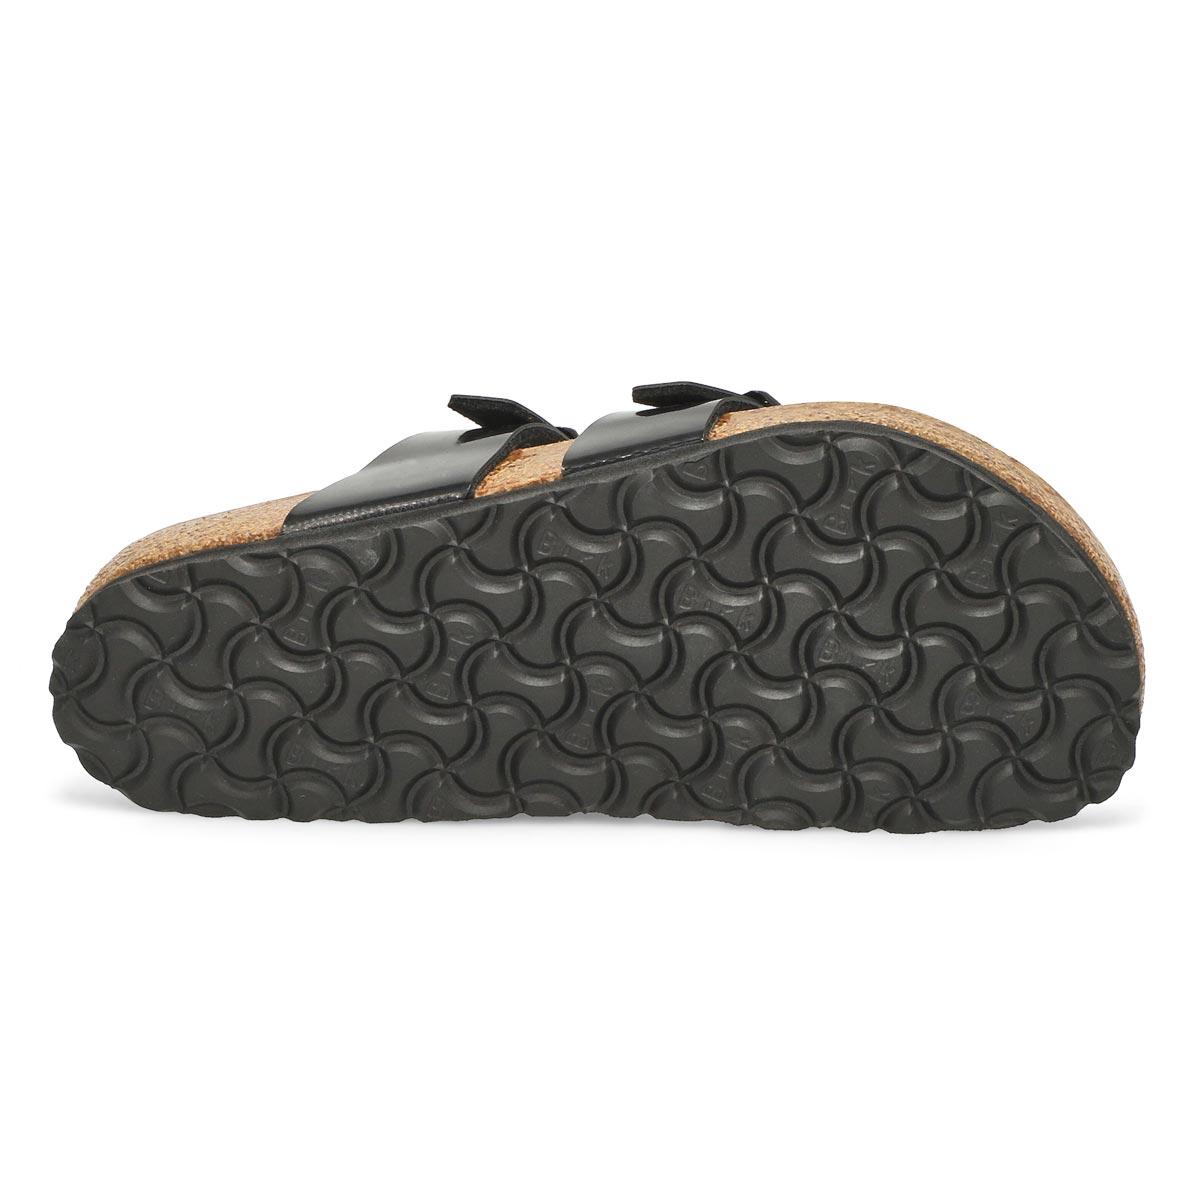 Women's Mayari BF Sandal - Black Patent